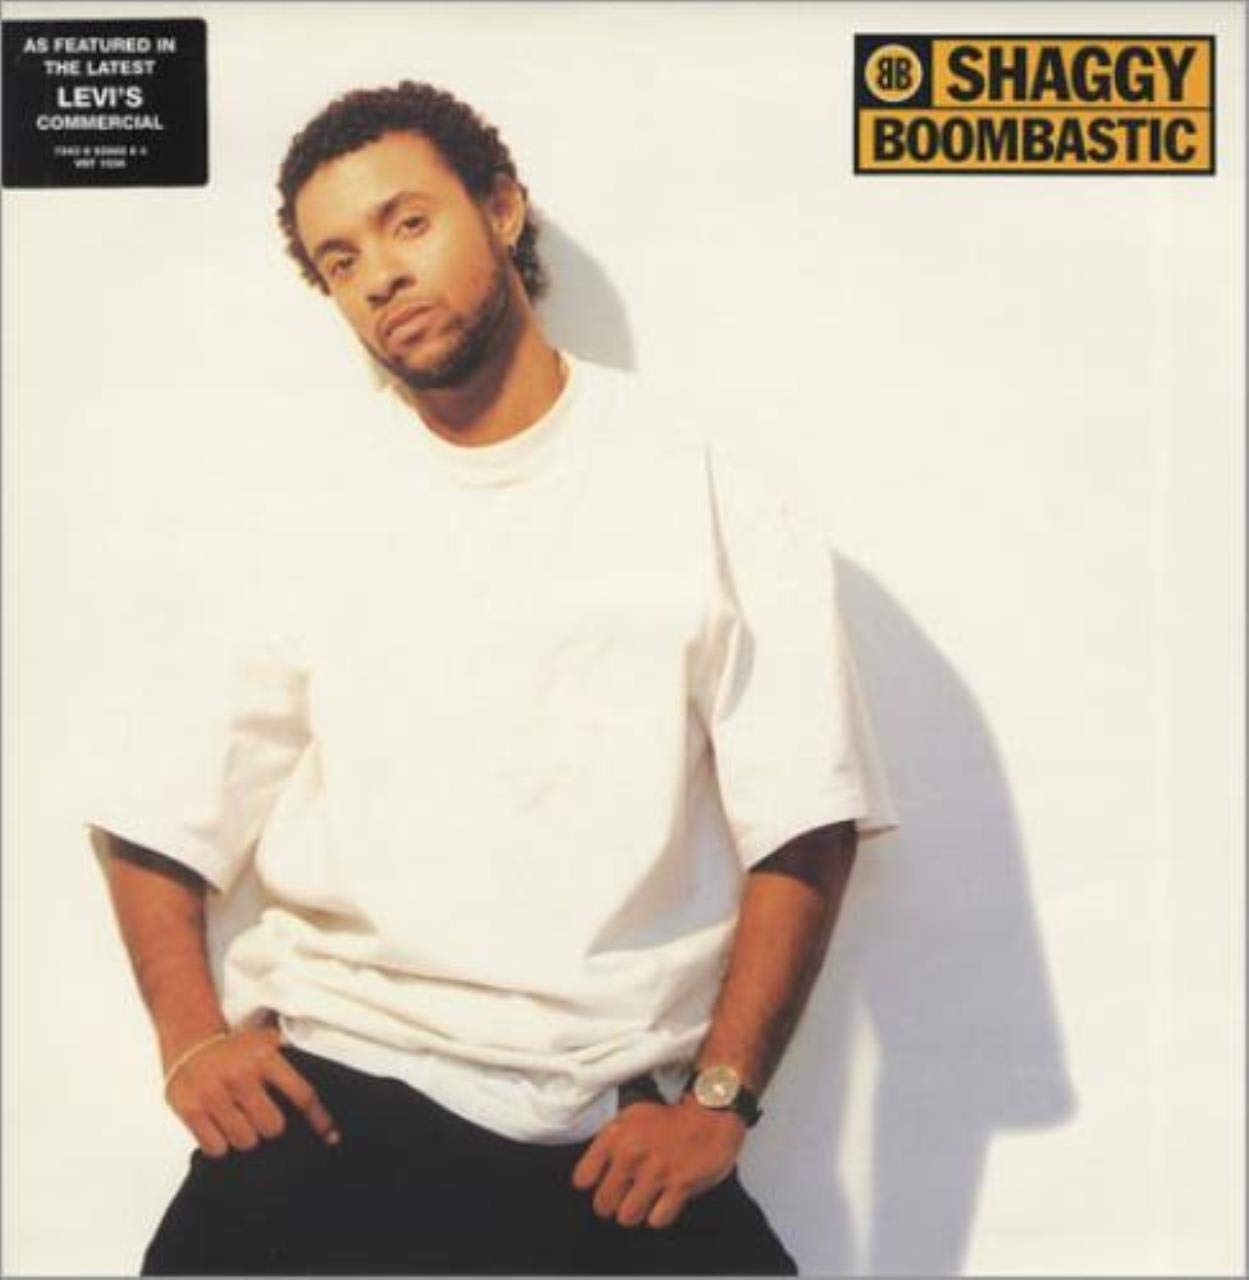 Shaggy / Boombastic